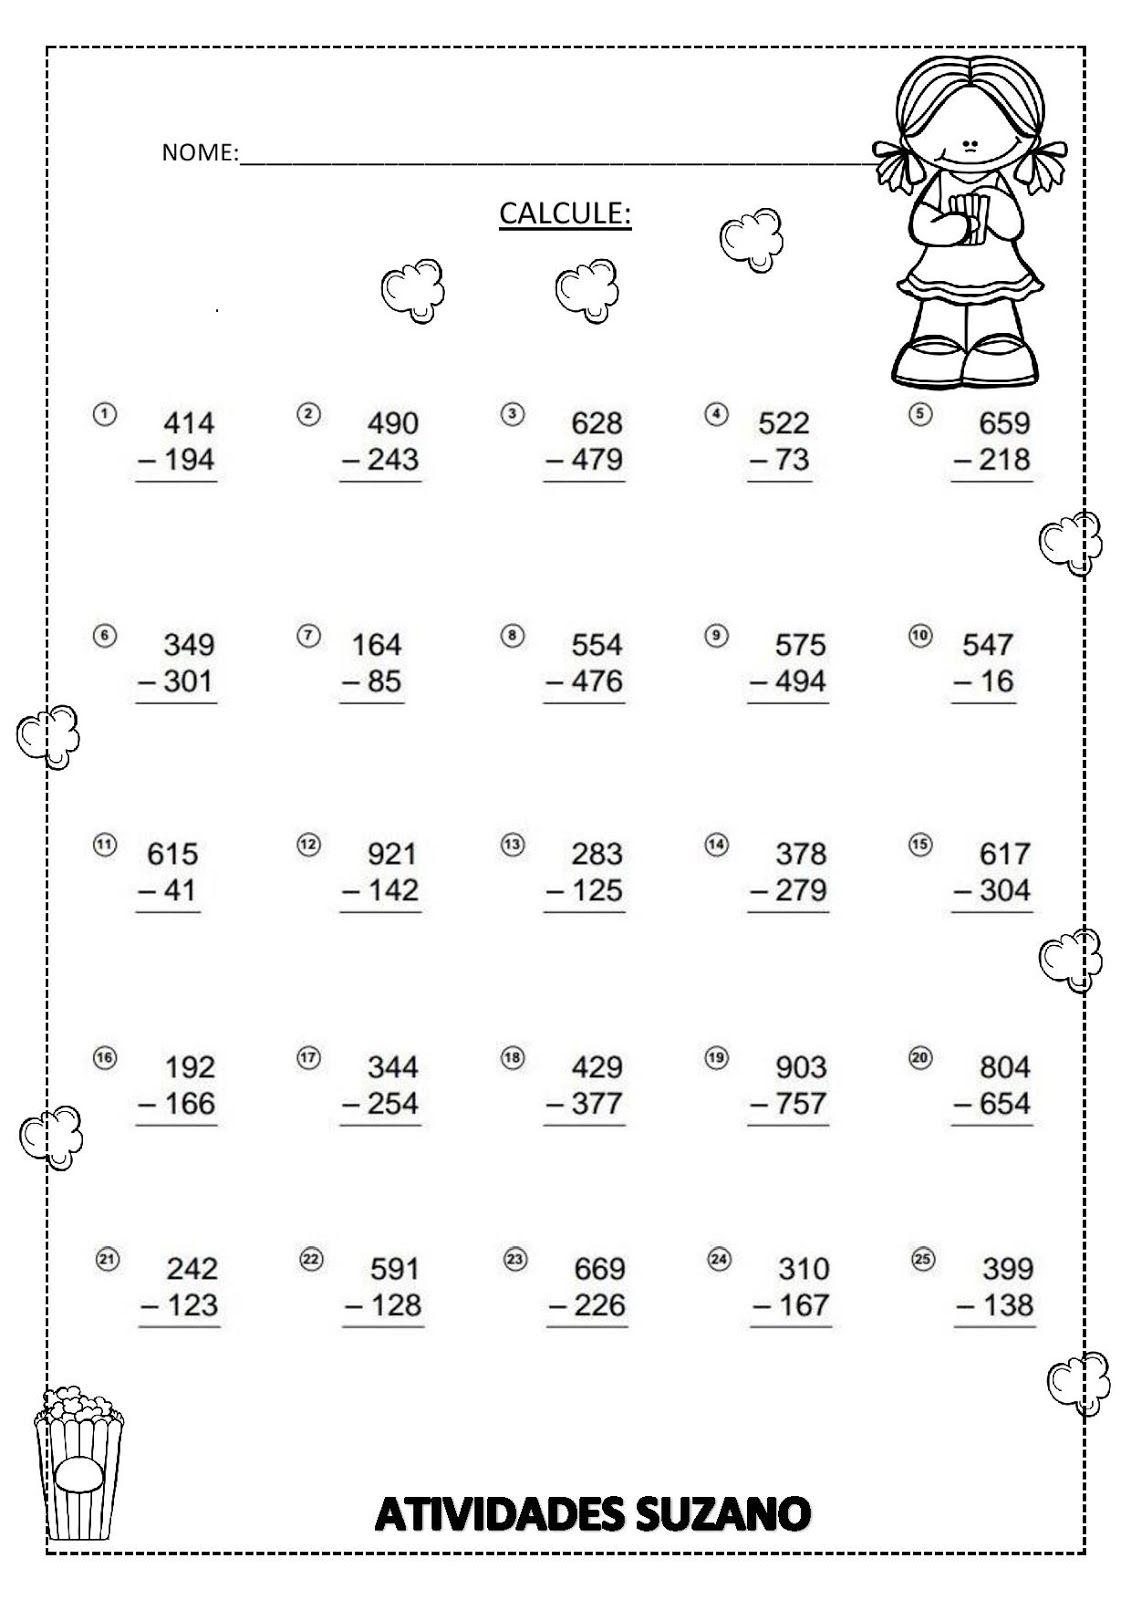 Pin von Gisele auf Matemática 2 | Pinterest | Mathe-Arbeitsblätter ...